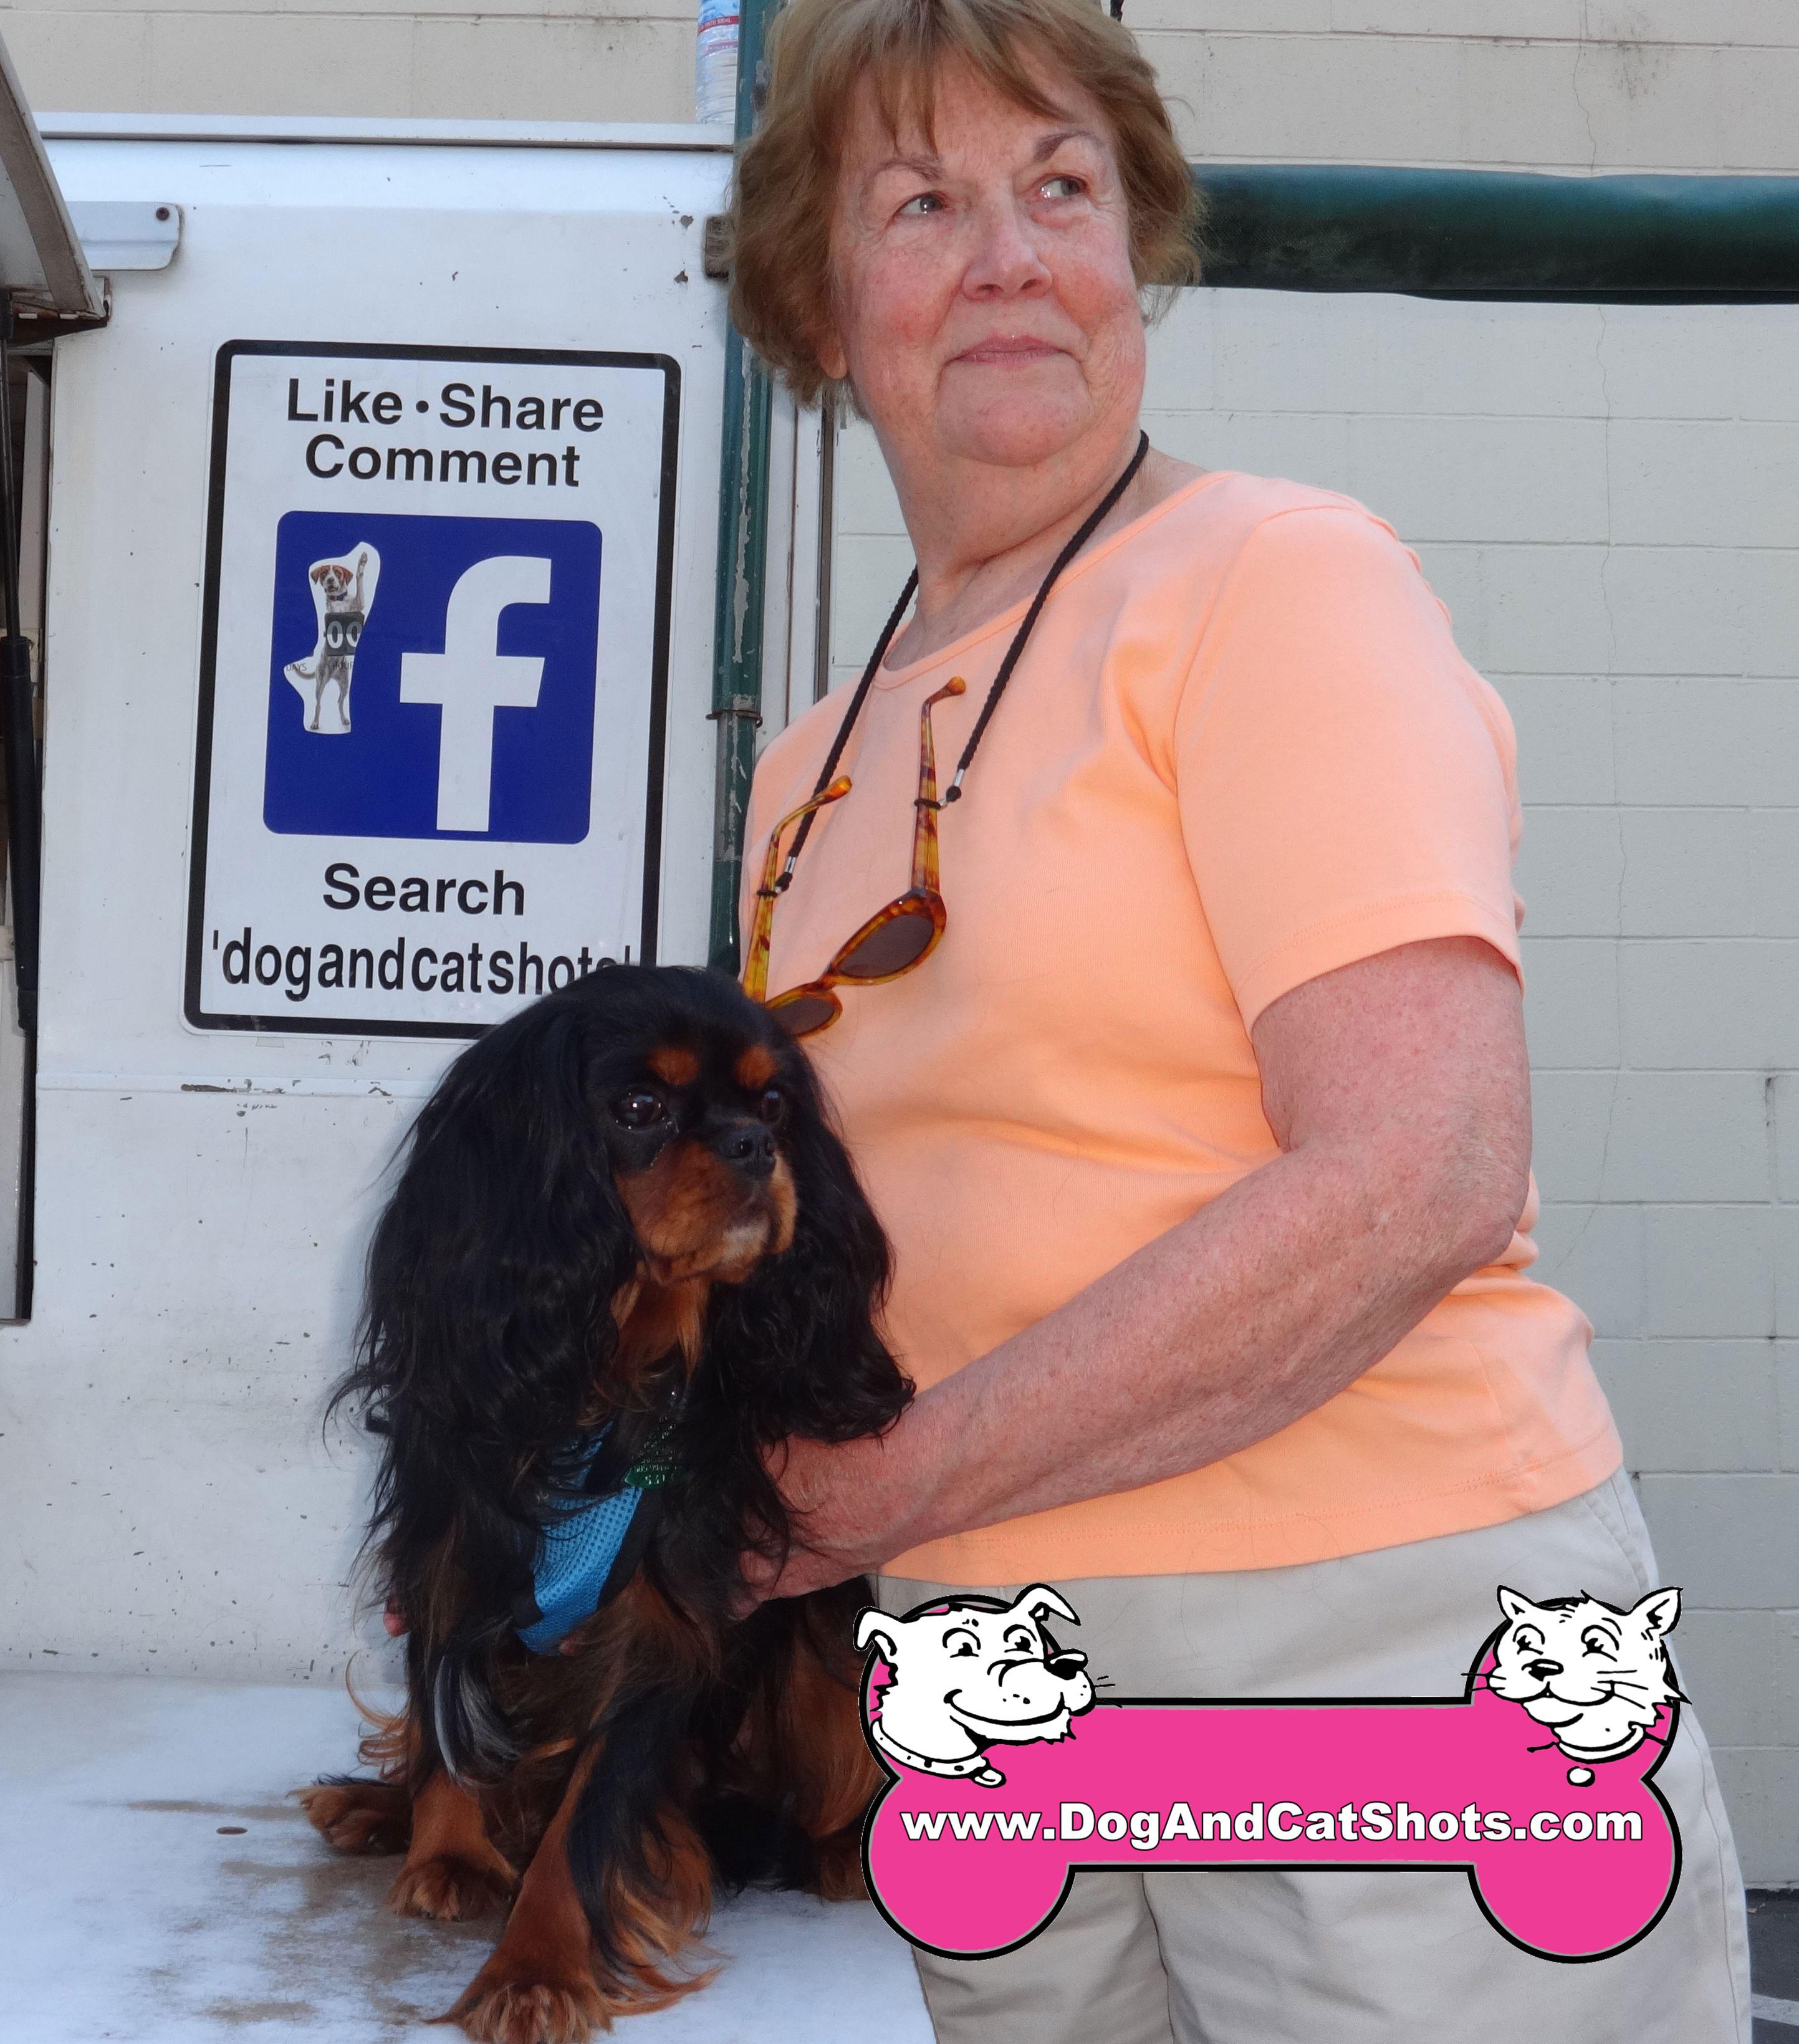 21-Bradshaw,-Cavalier-King-Charles-Spaniel,--Teddy-dog-and-cat-shots